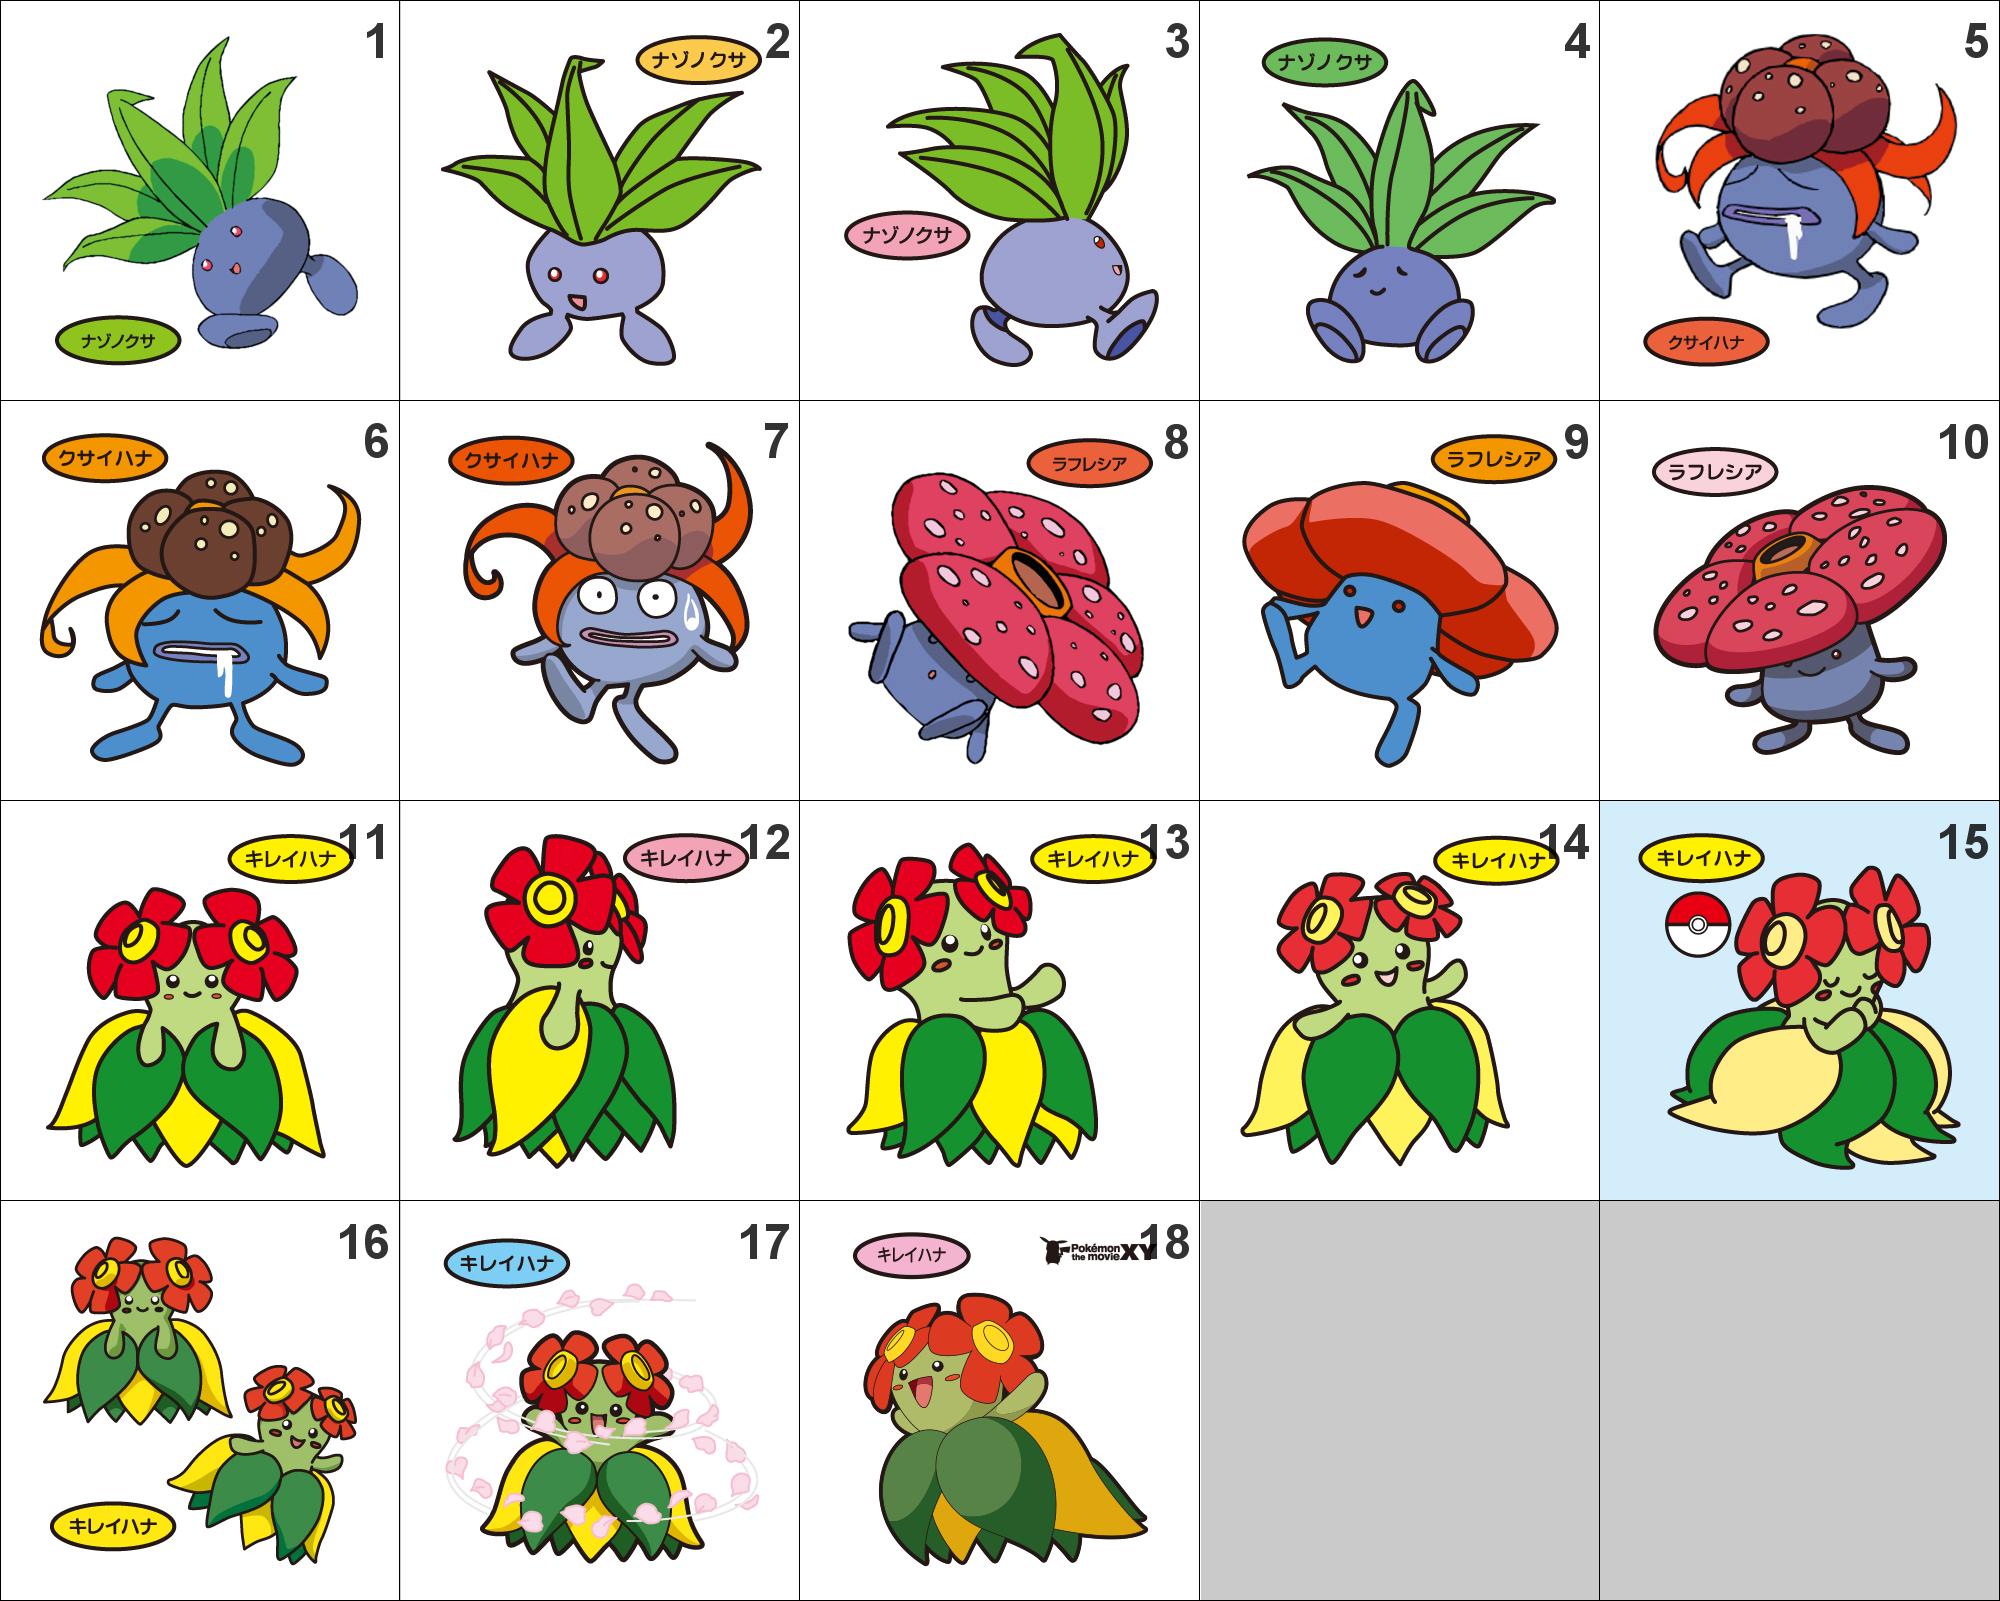 Uncategorized Gloom Pokemon 043 044 045 182 oddish gloom vileplume bellossom pan stickers